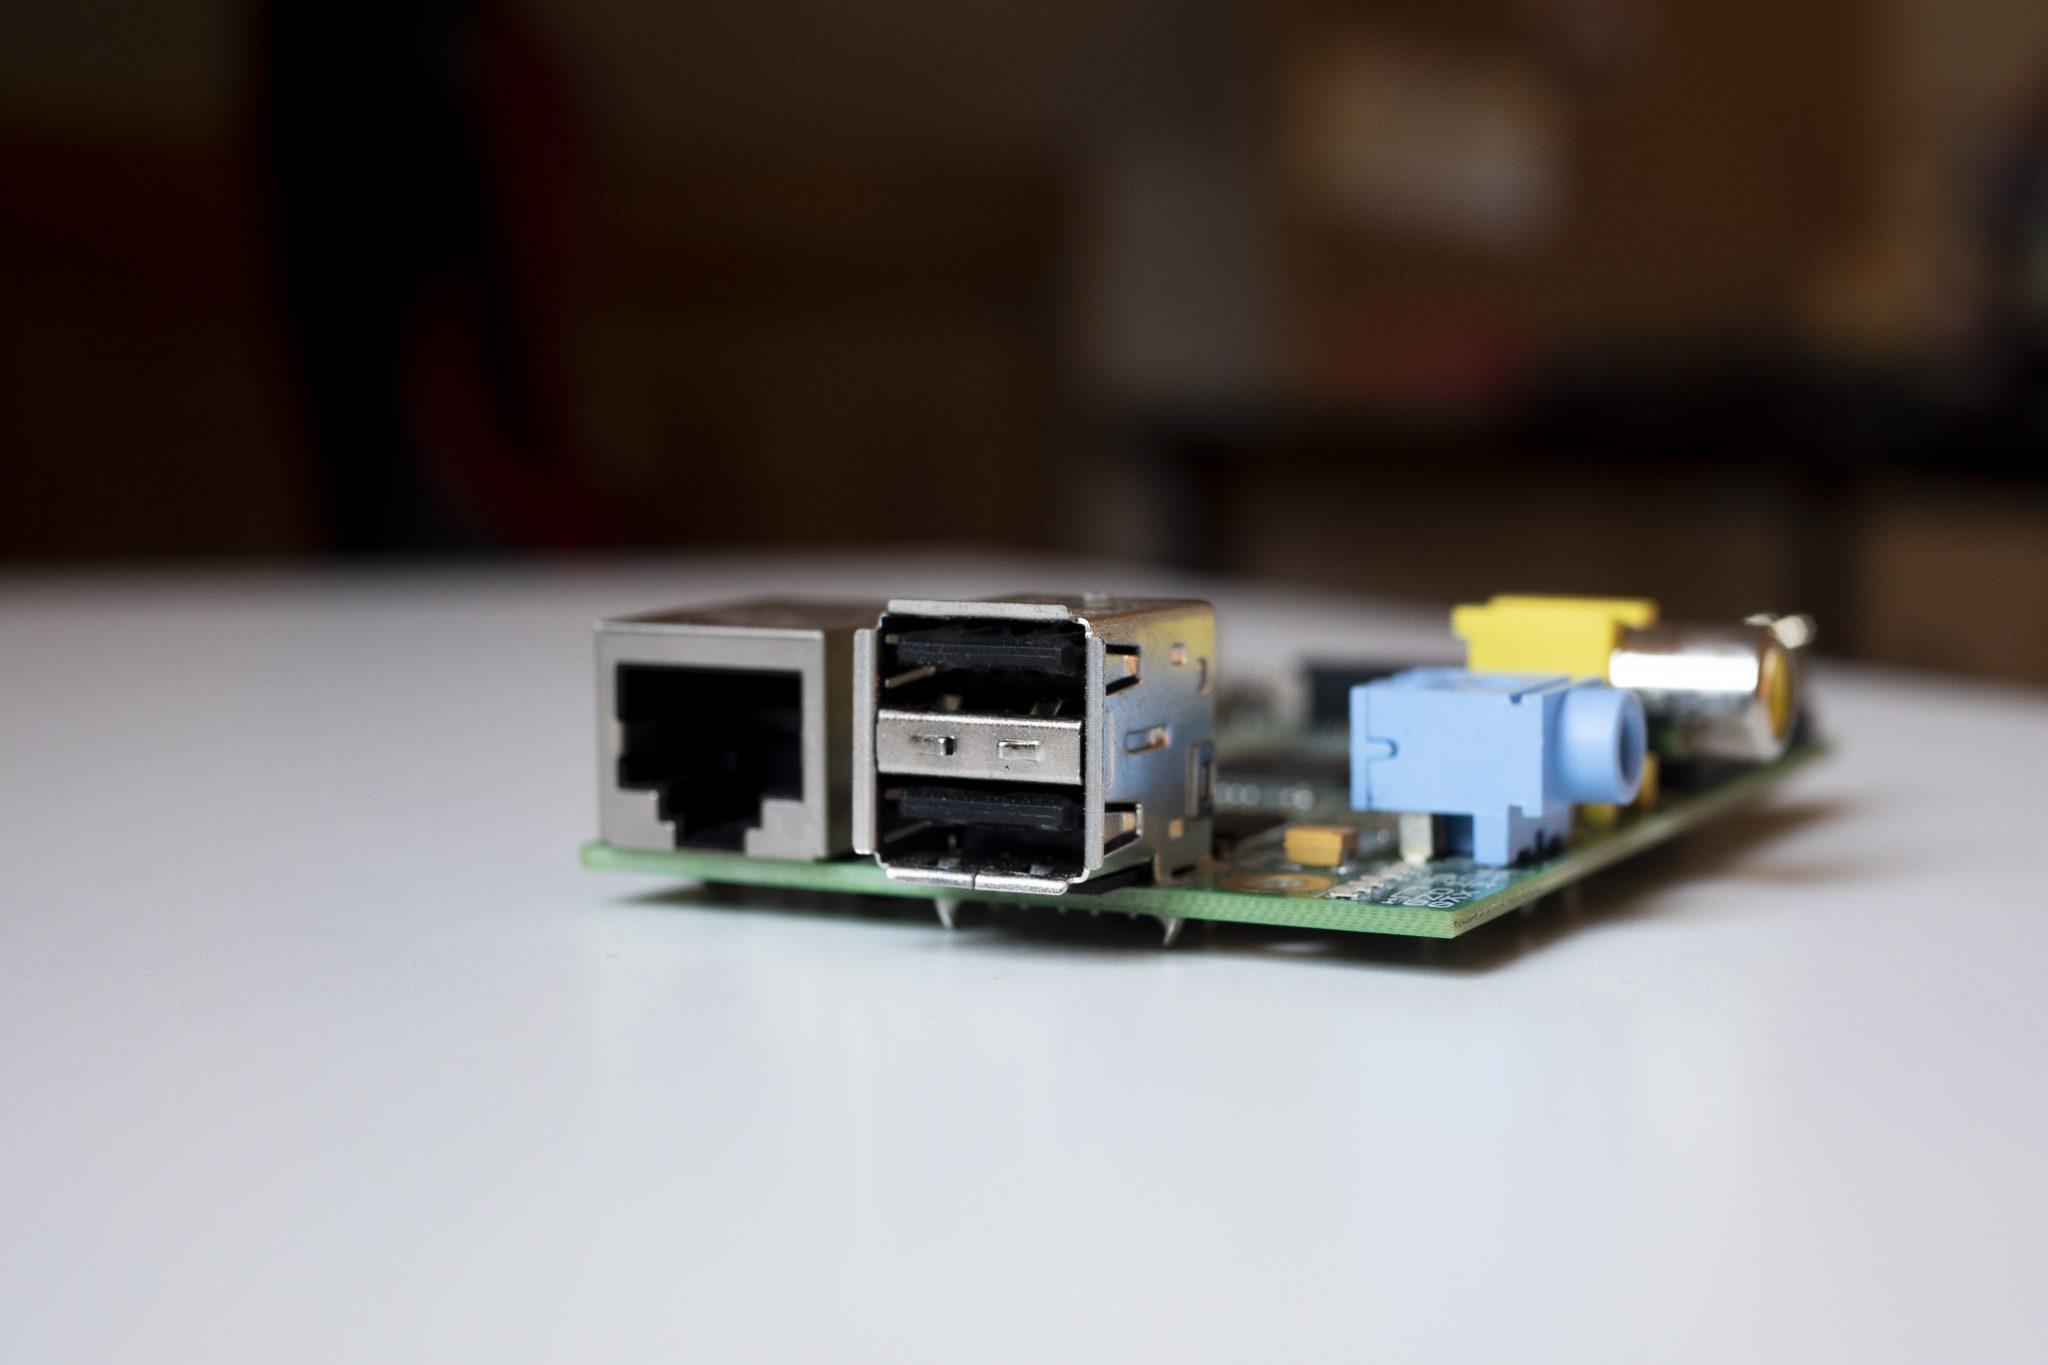 Így lett a Raspberry Pi-ből média center 4